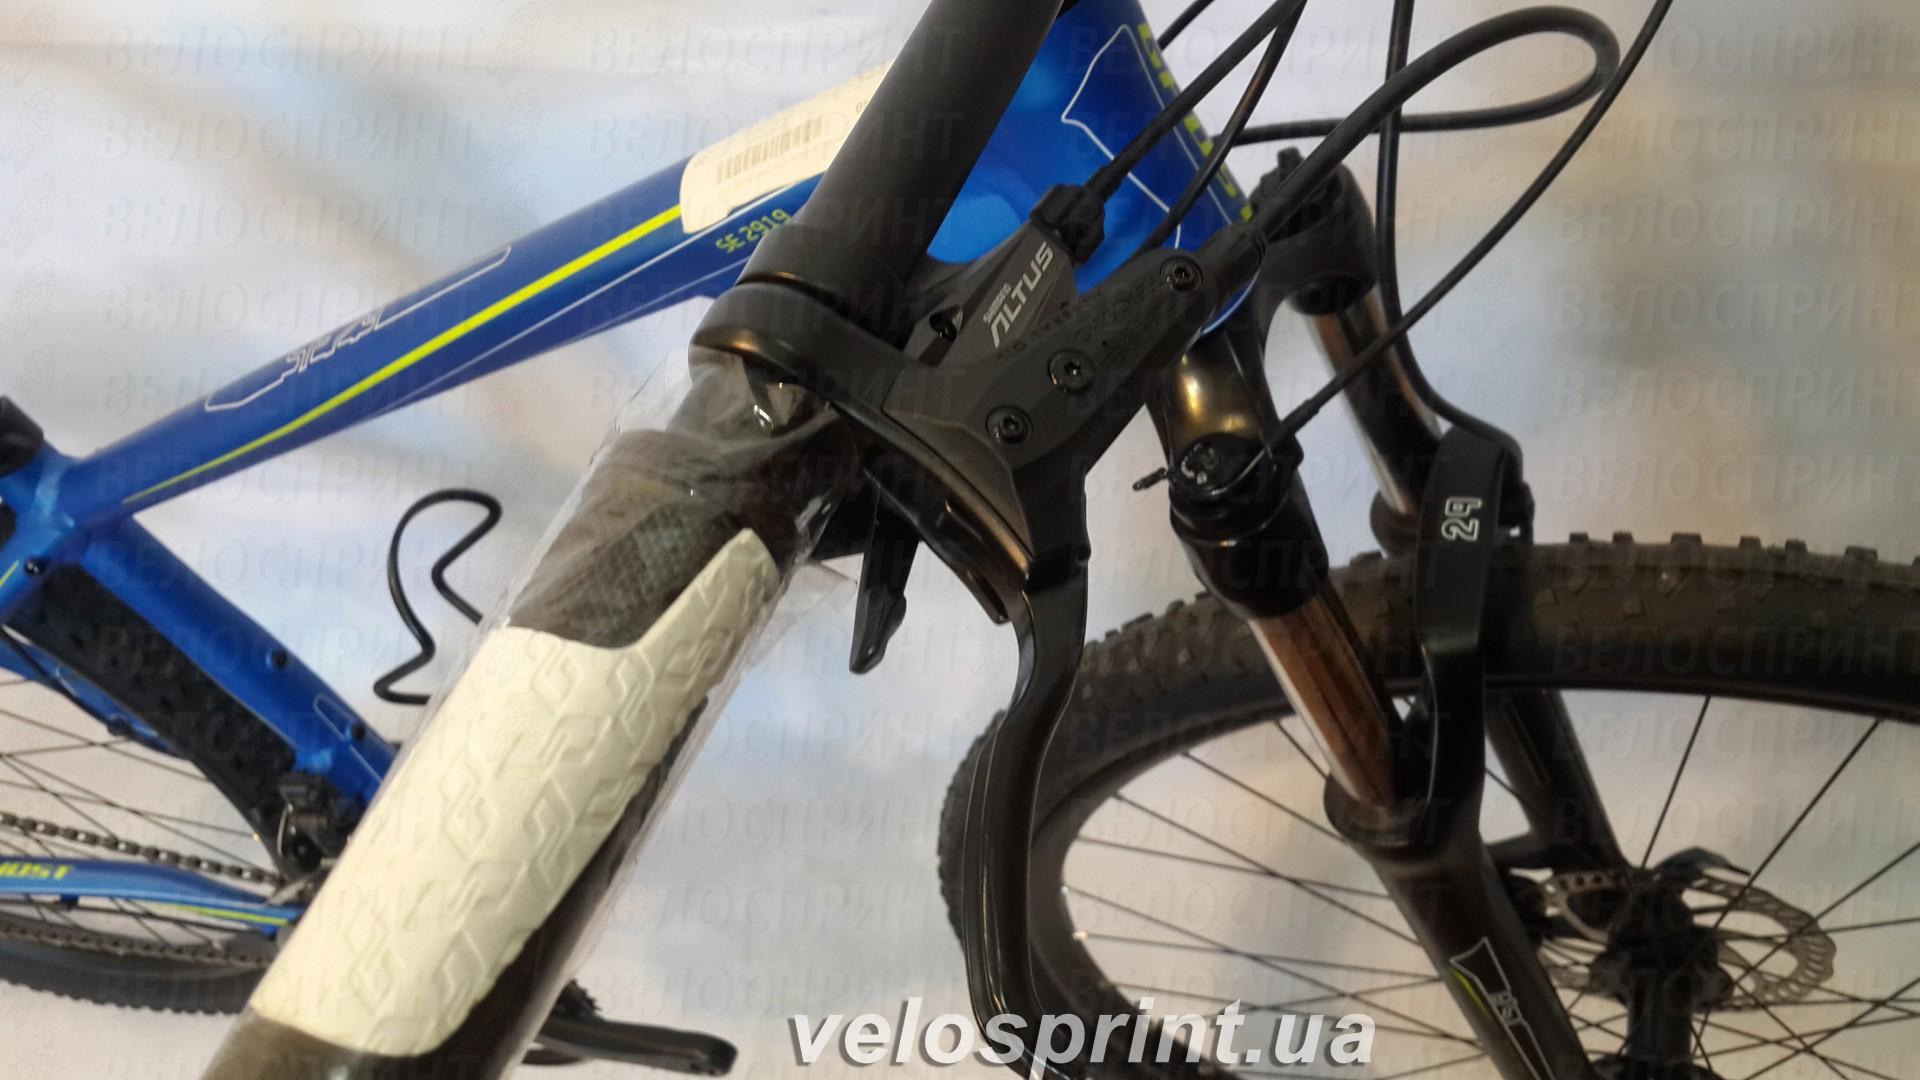 Велосипед GHOST SE 2919 blue/white/green тормозная ручка год 2014